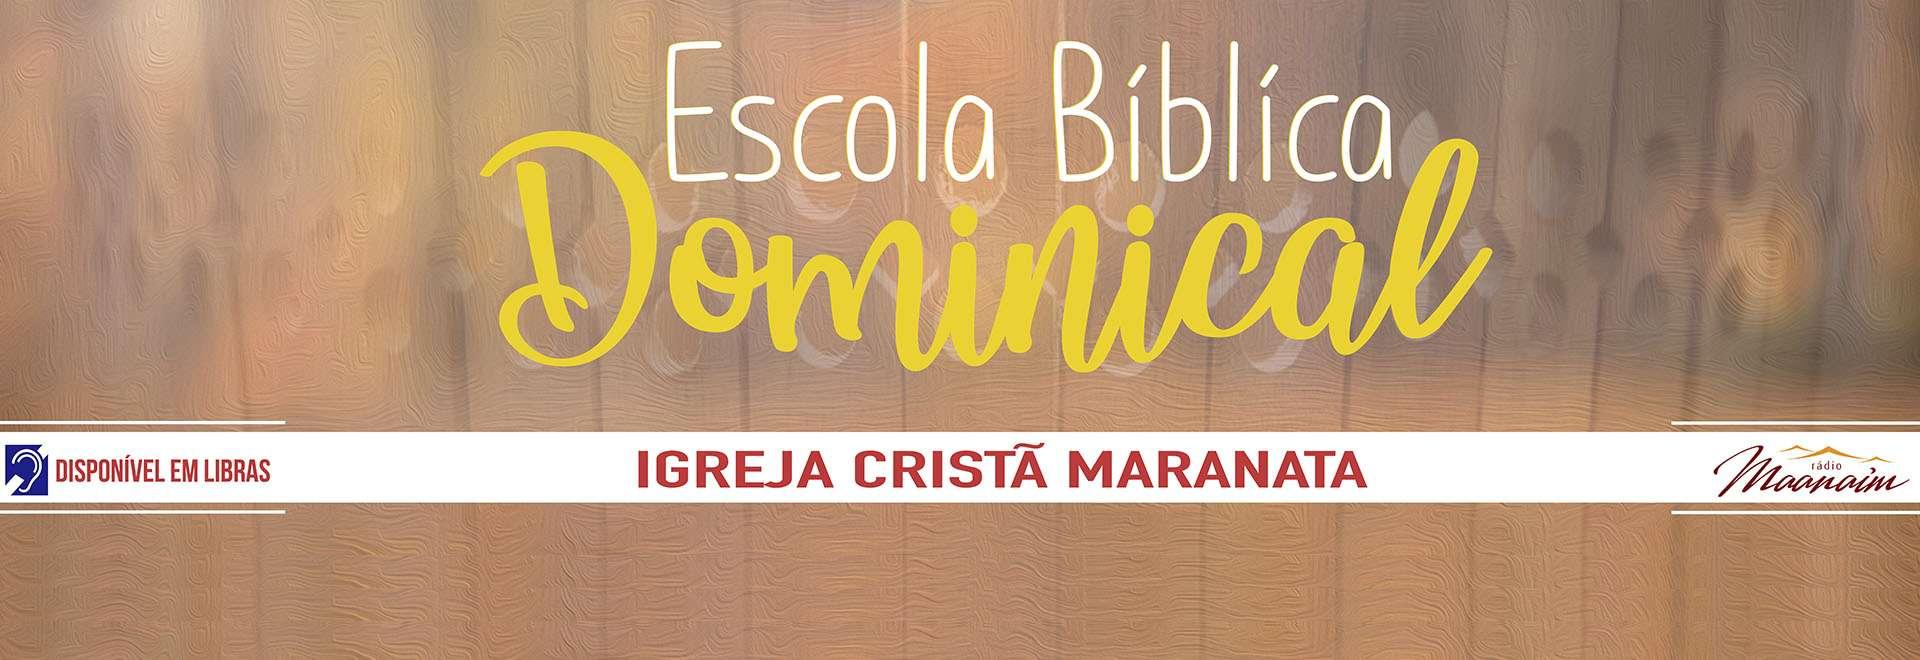 Participações da EBD da Igreja Cristã Maranata - 22/11/2020